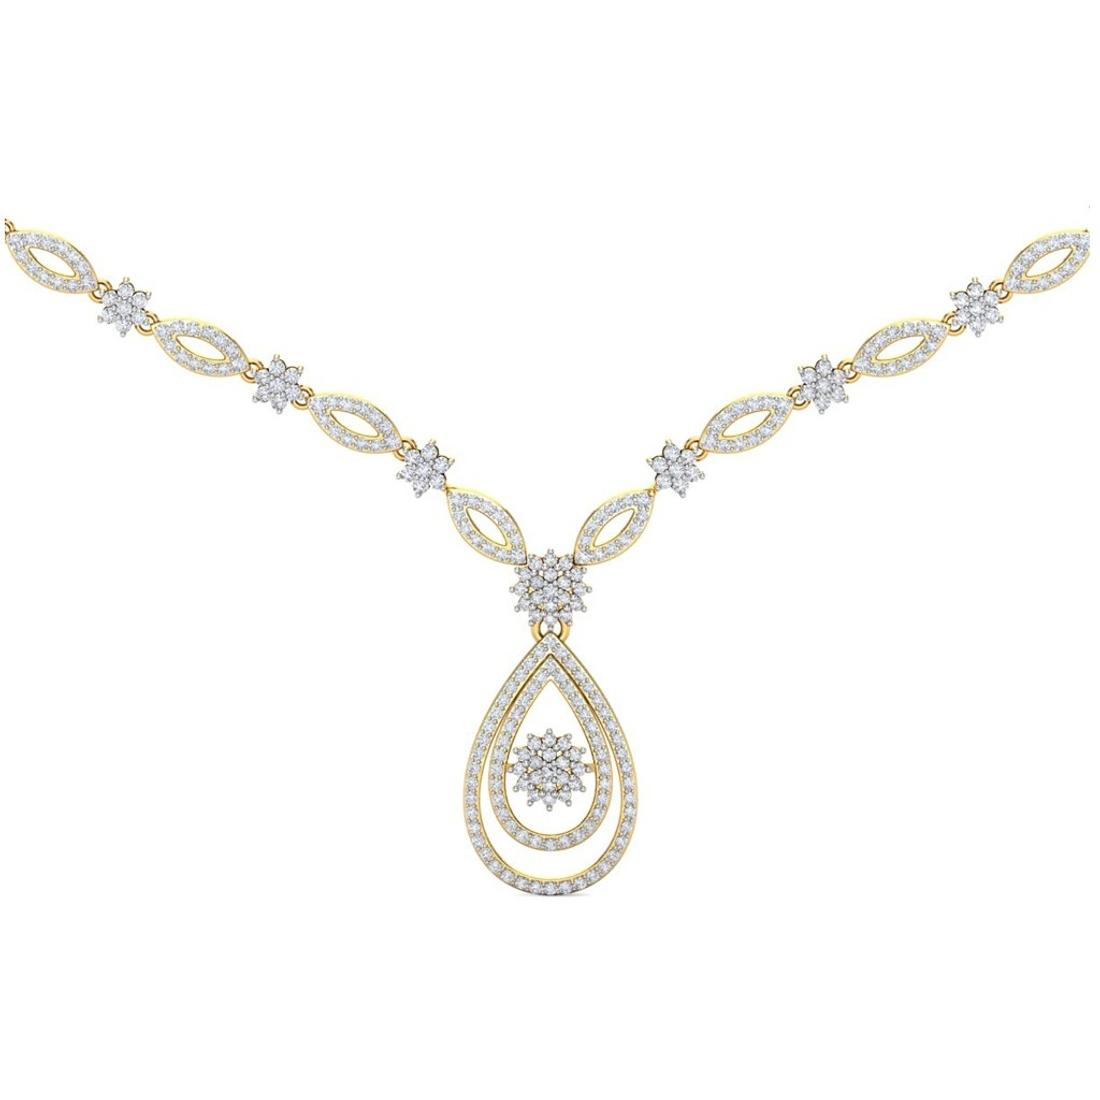 Sarvada Jewels' The Erina Diamond Necklace